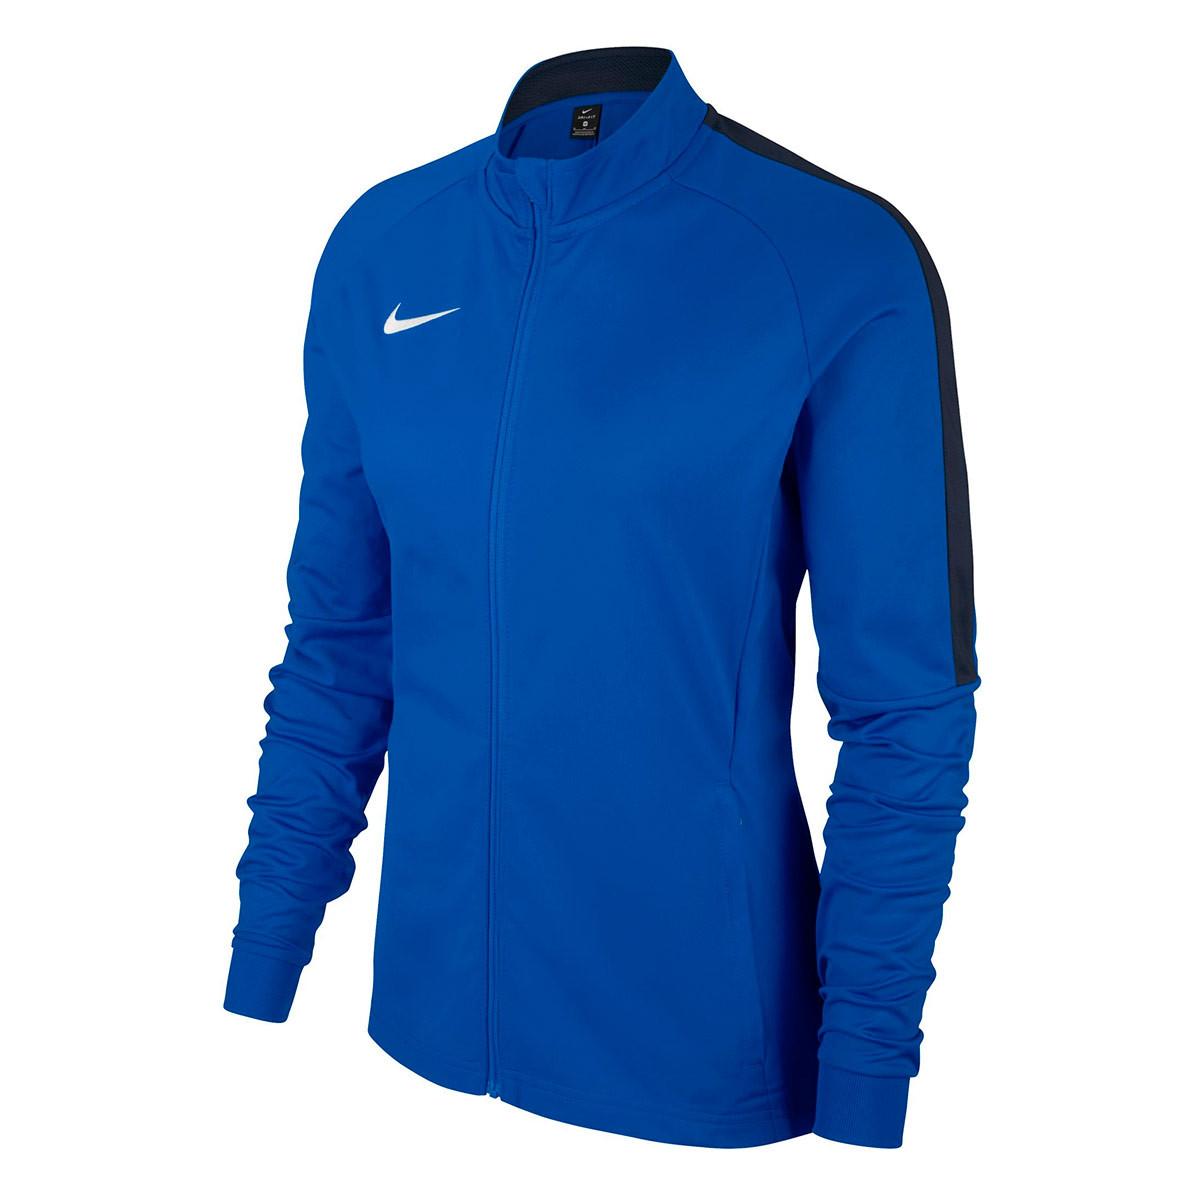 Lesionarse fotografía fuego  Jacket Nike Woman Academy 18 Knit Royal blue-Obsidian-White - Football  store Fútbol Emotion